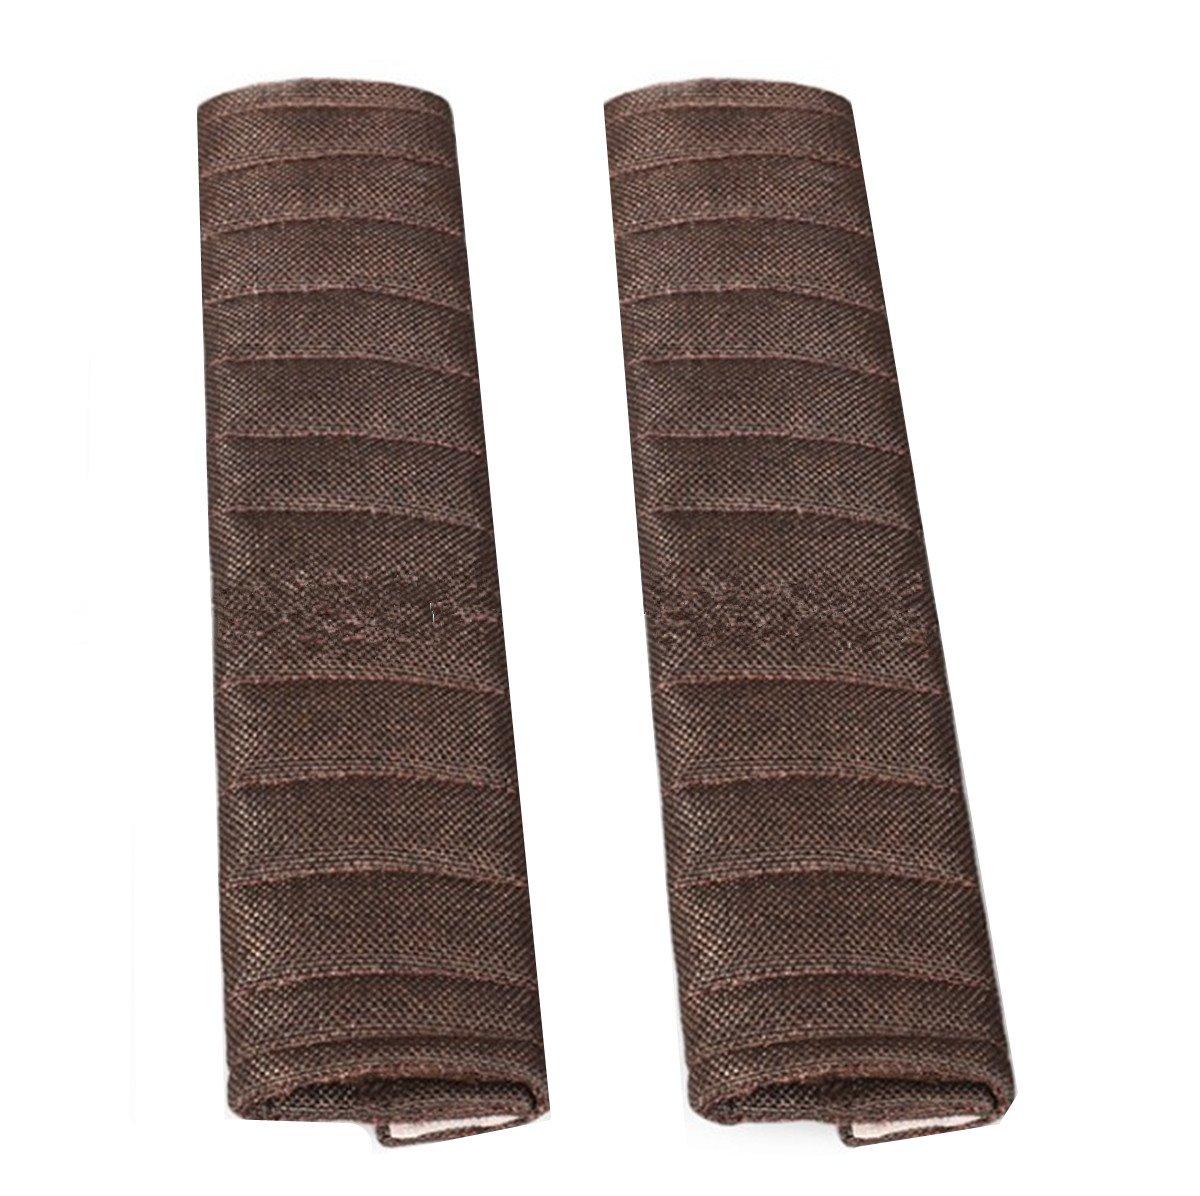 Fochutech 2Pcs Car Linen Seat Belt Shoulder Pad Strap Cover Adjuster Protector Comfortable Driving (Beige)